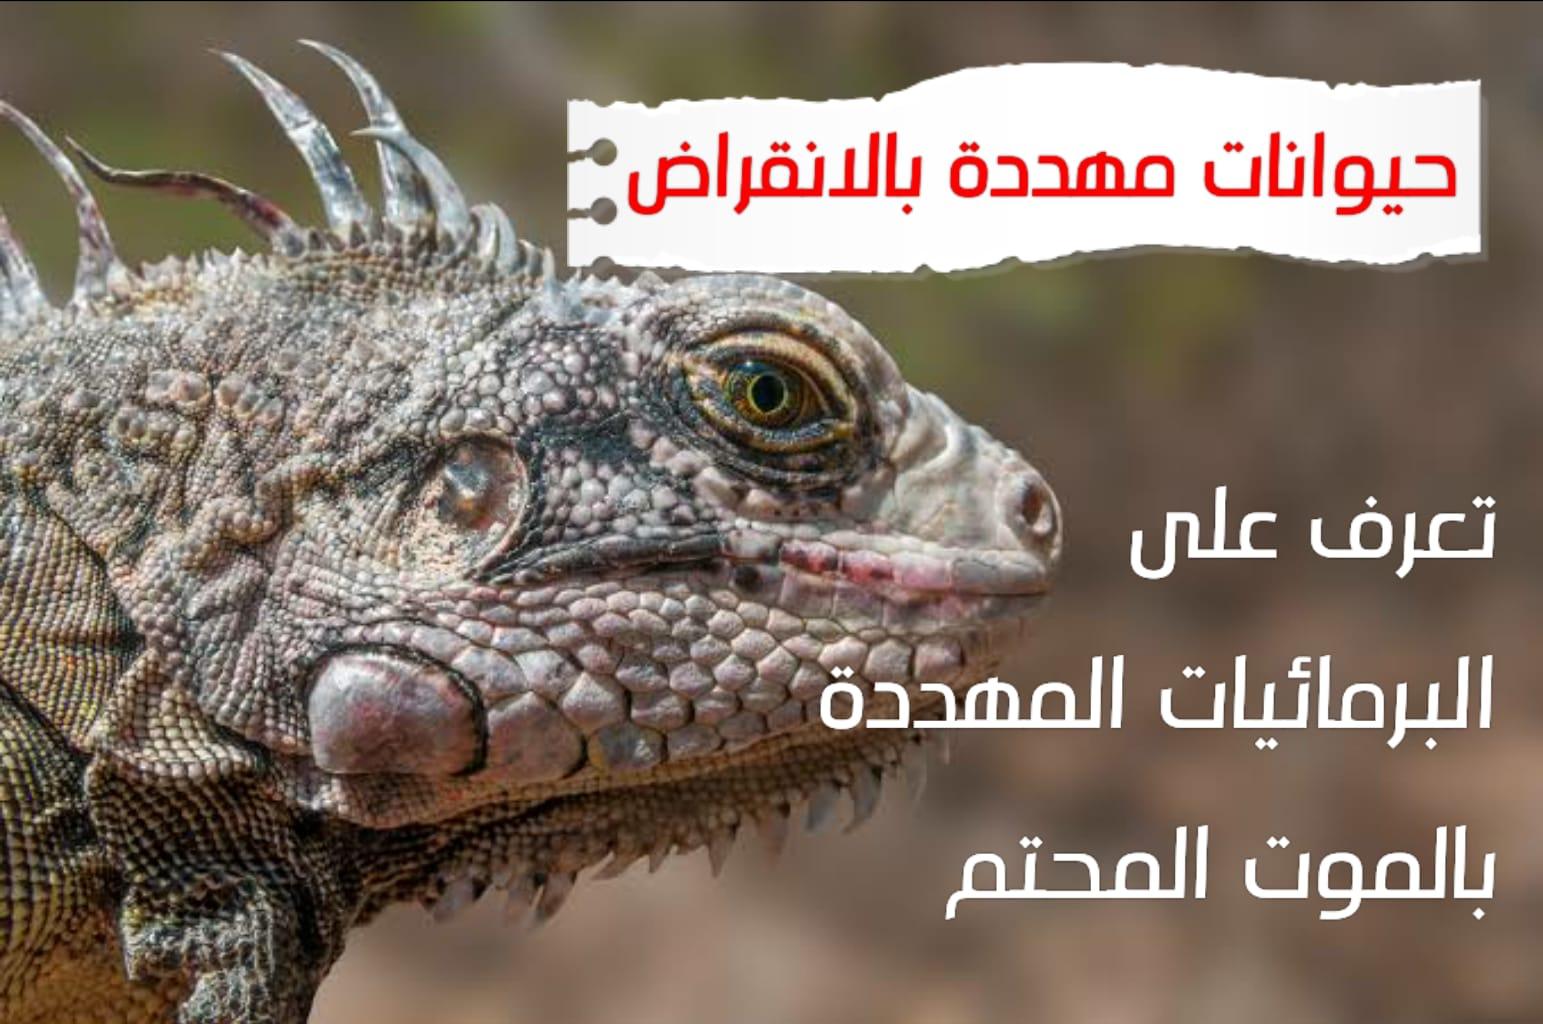 WhatsApp Image 2020 06 24 at 4.09.16 AM - حيوانات مهددة بالإنقراض برمائيات مهددة بالإنقراض